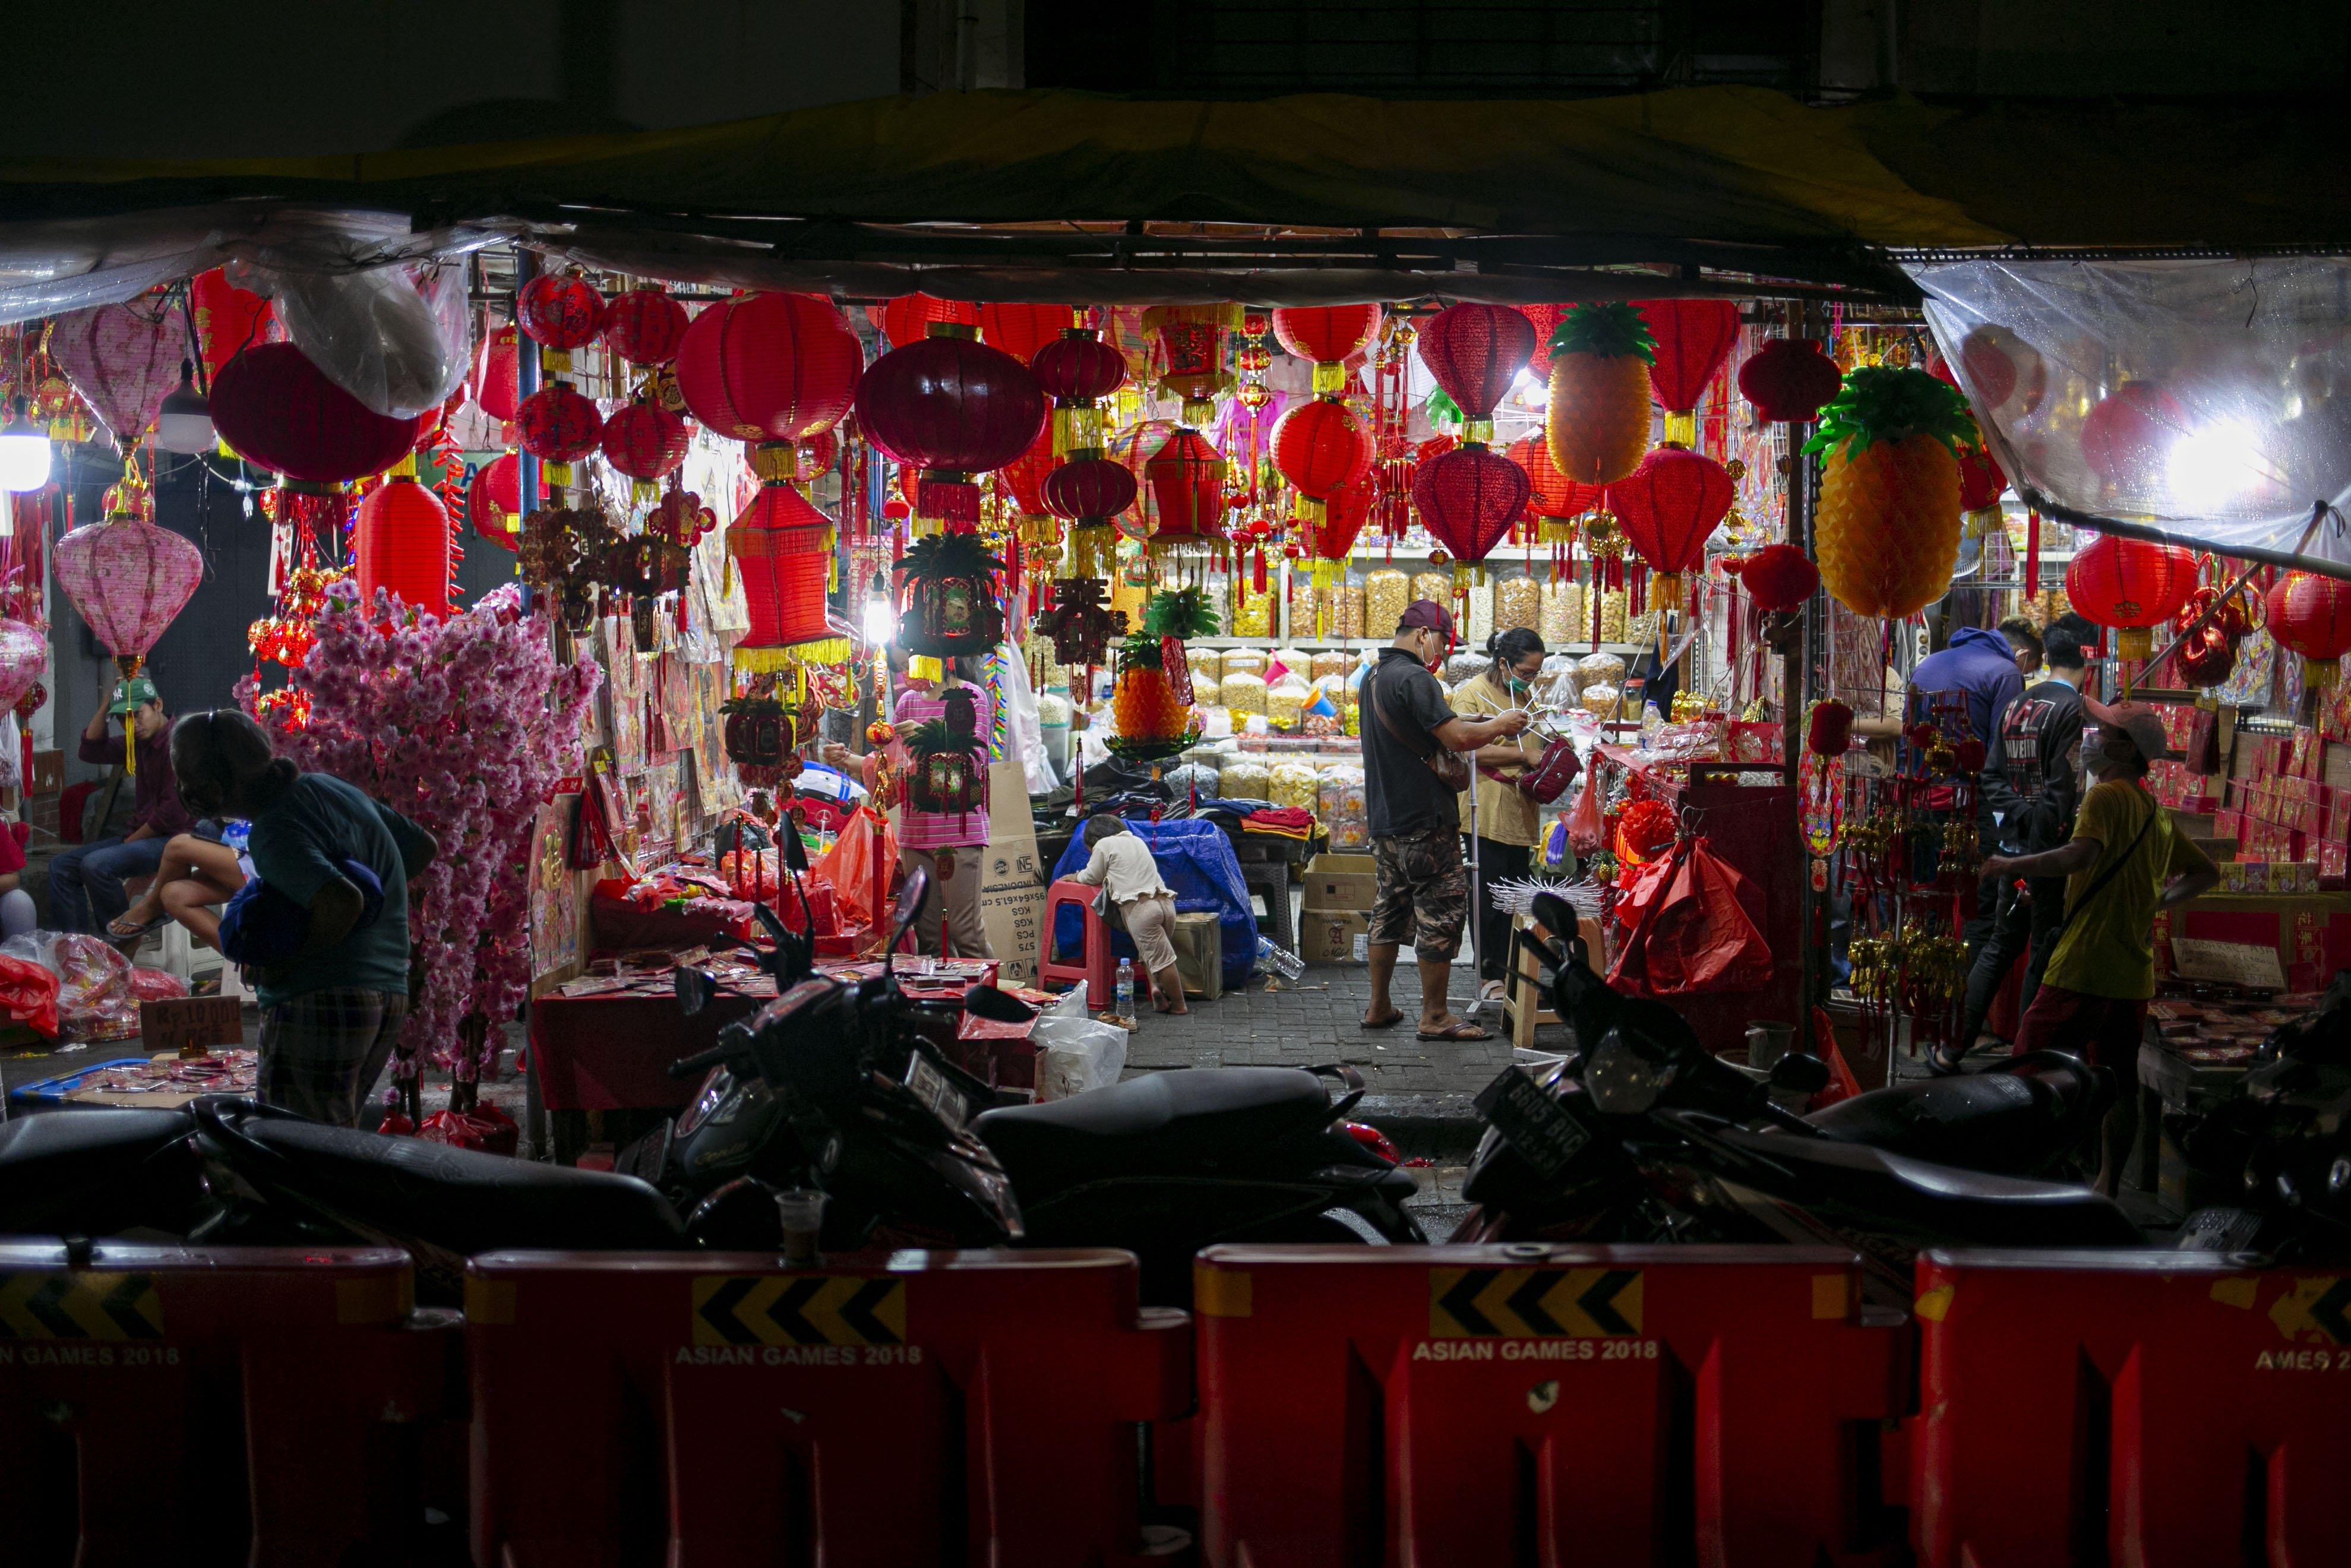 Pedagang merapikan pernak pernik Imlek yang dijual di Pasar Glodok, Jakarta, Kamis (11/2/2021). Pedagang di lokasi tersebut mengaku penjualan tahun ini anjlok hingga 80 persen dibandingkan tahun lalu akibat pandemi COVID 19.